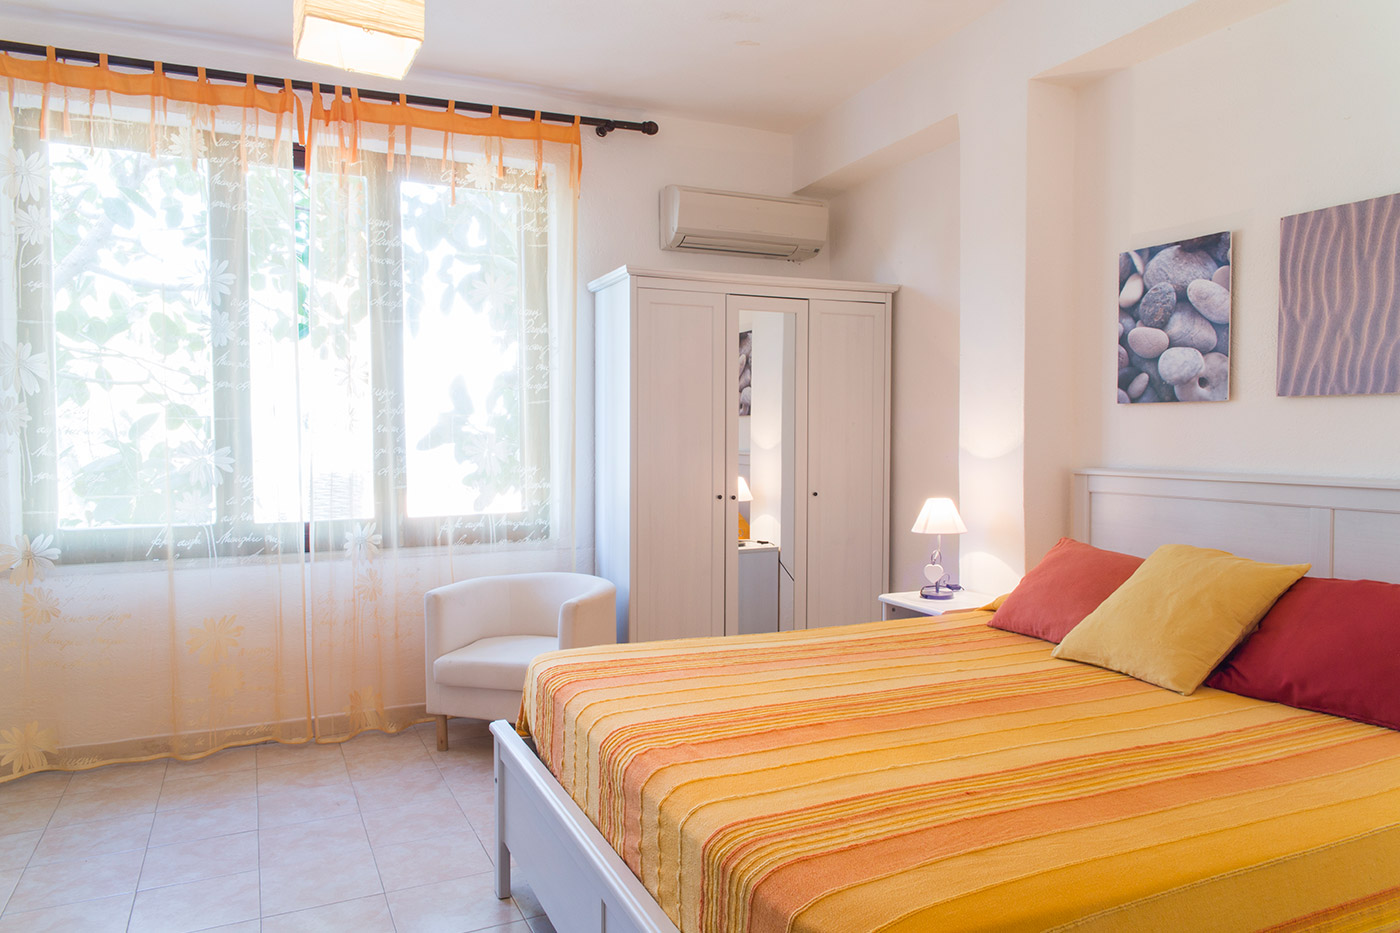 Camere standard Hotel 3 Stelle Giardino Eden Ischia